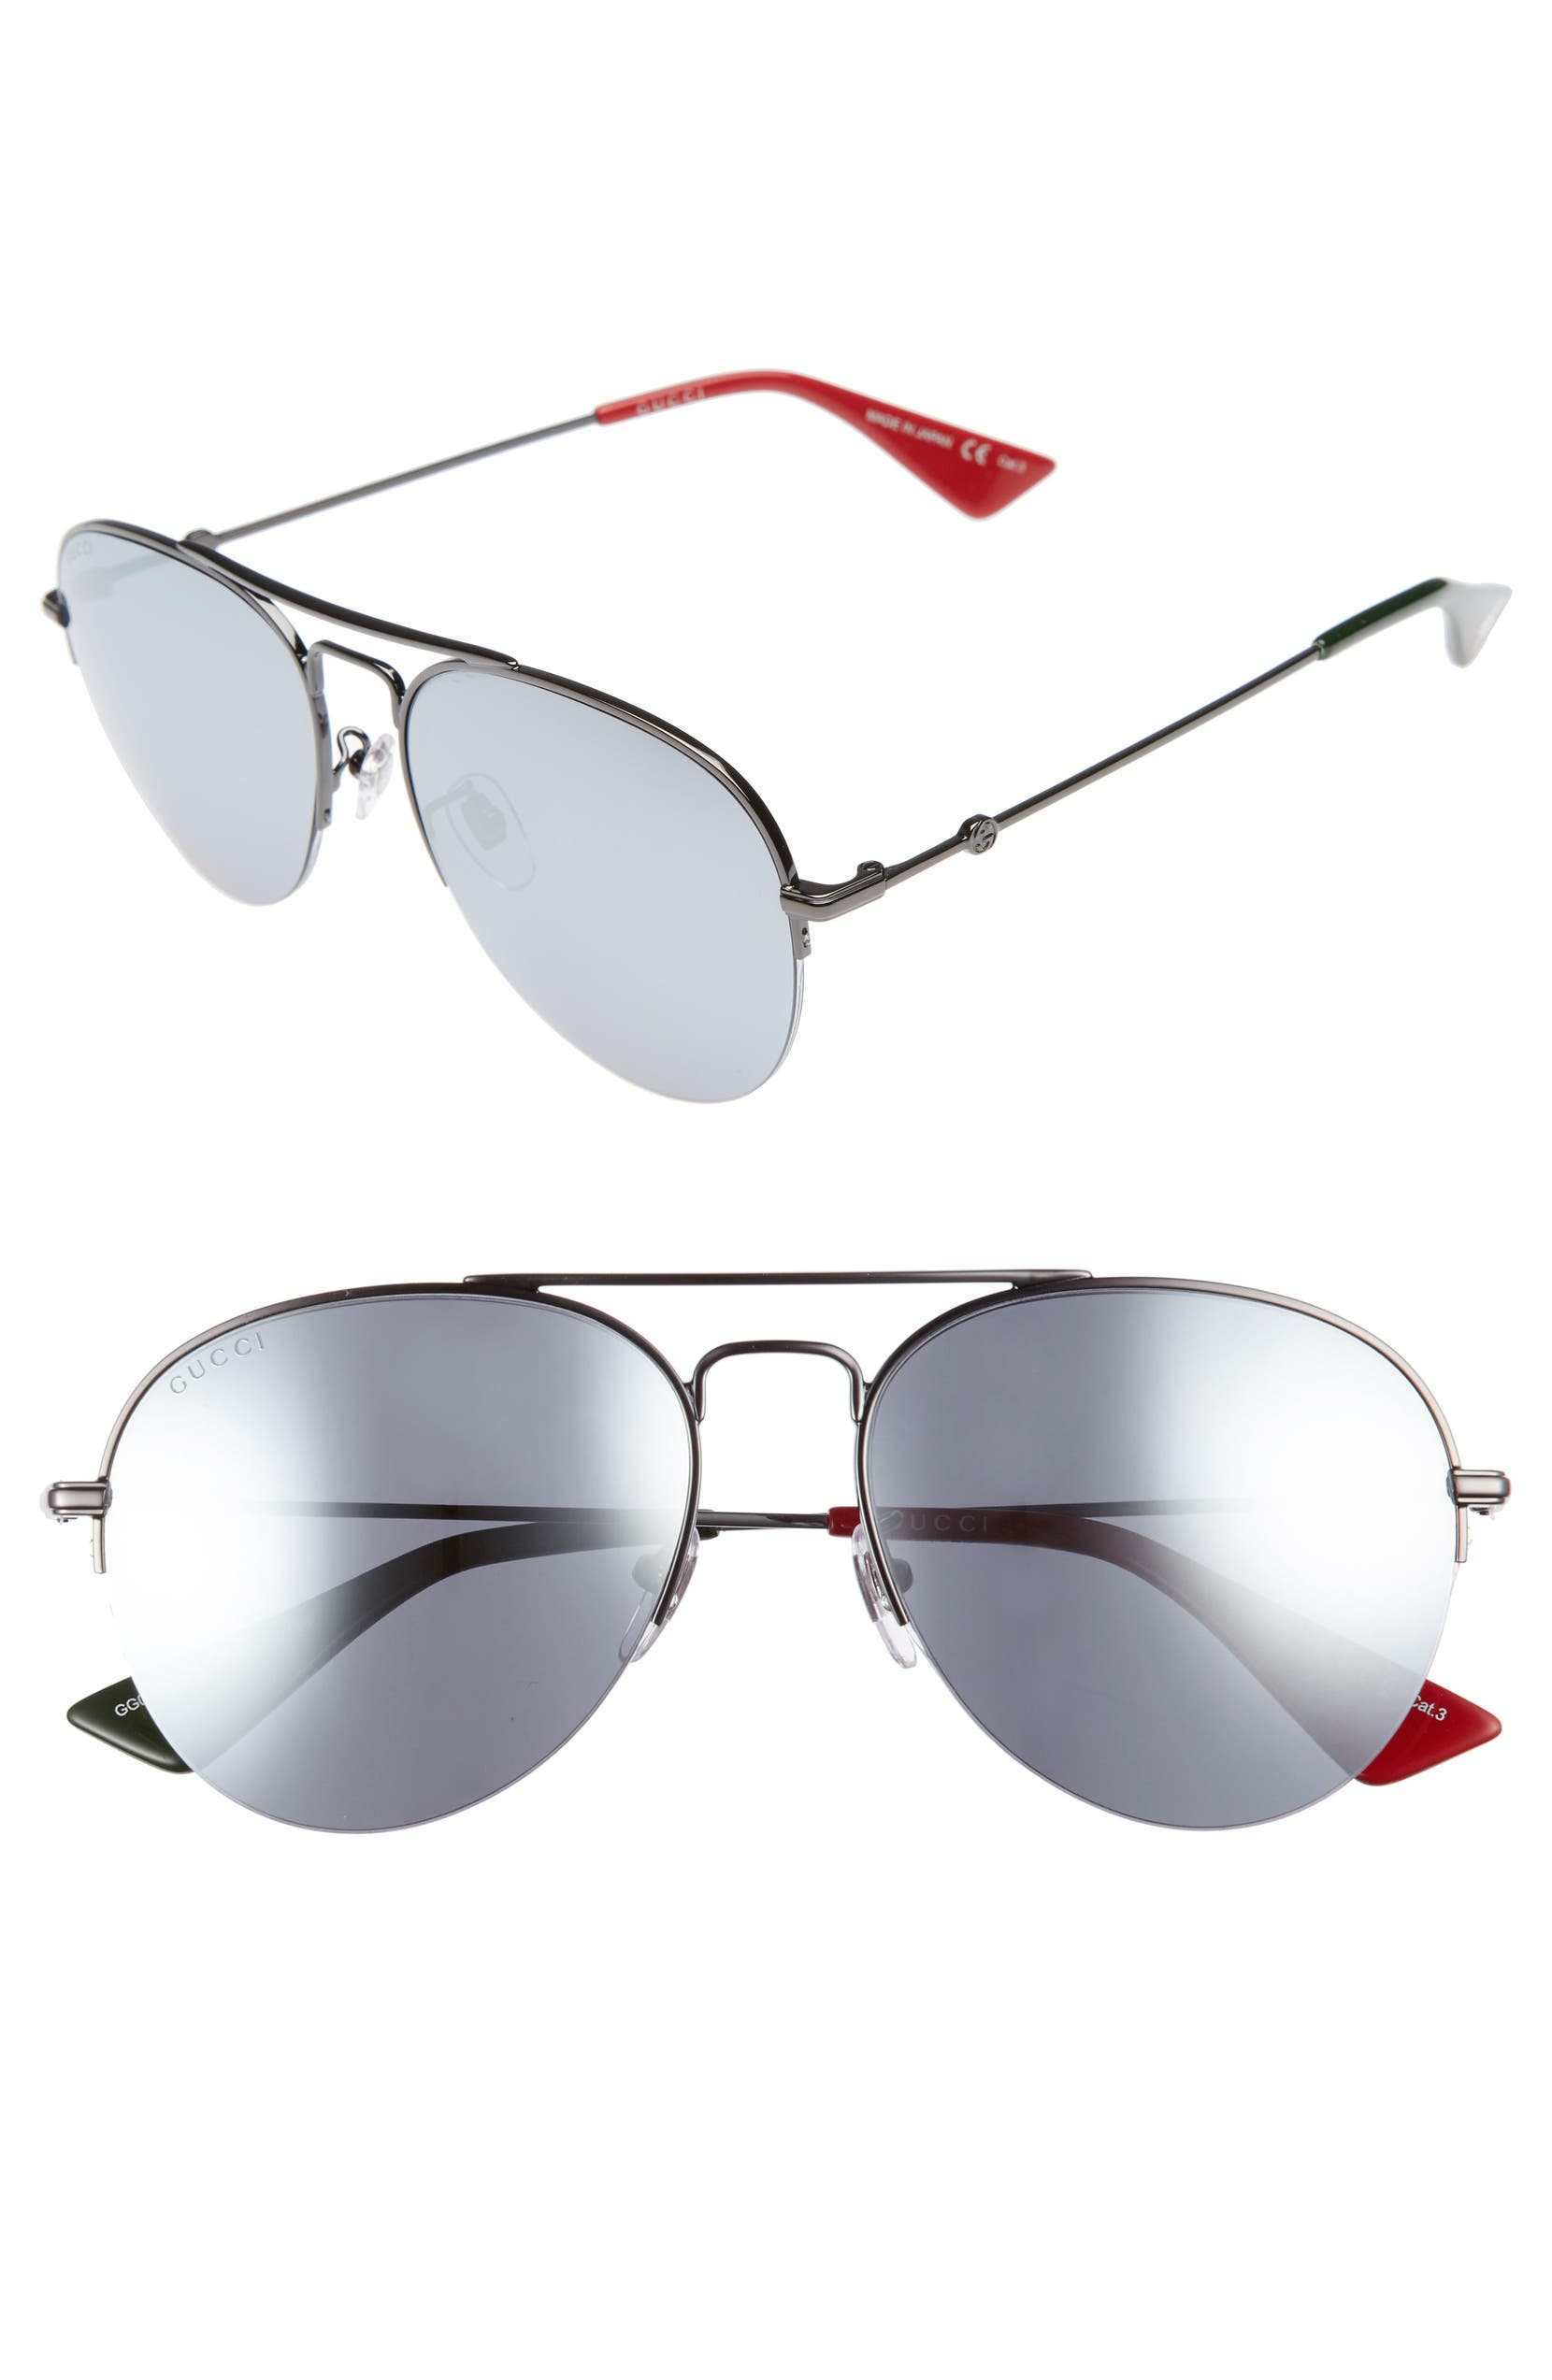 3ce6467d875 Gucci Pilot 56mm Aviator Sunglasses